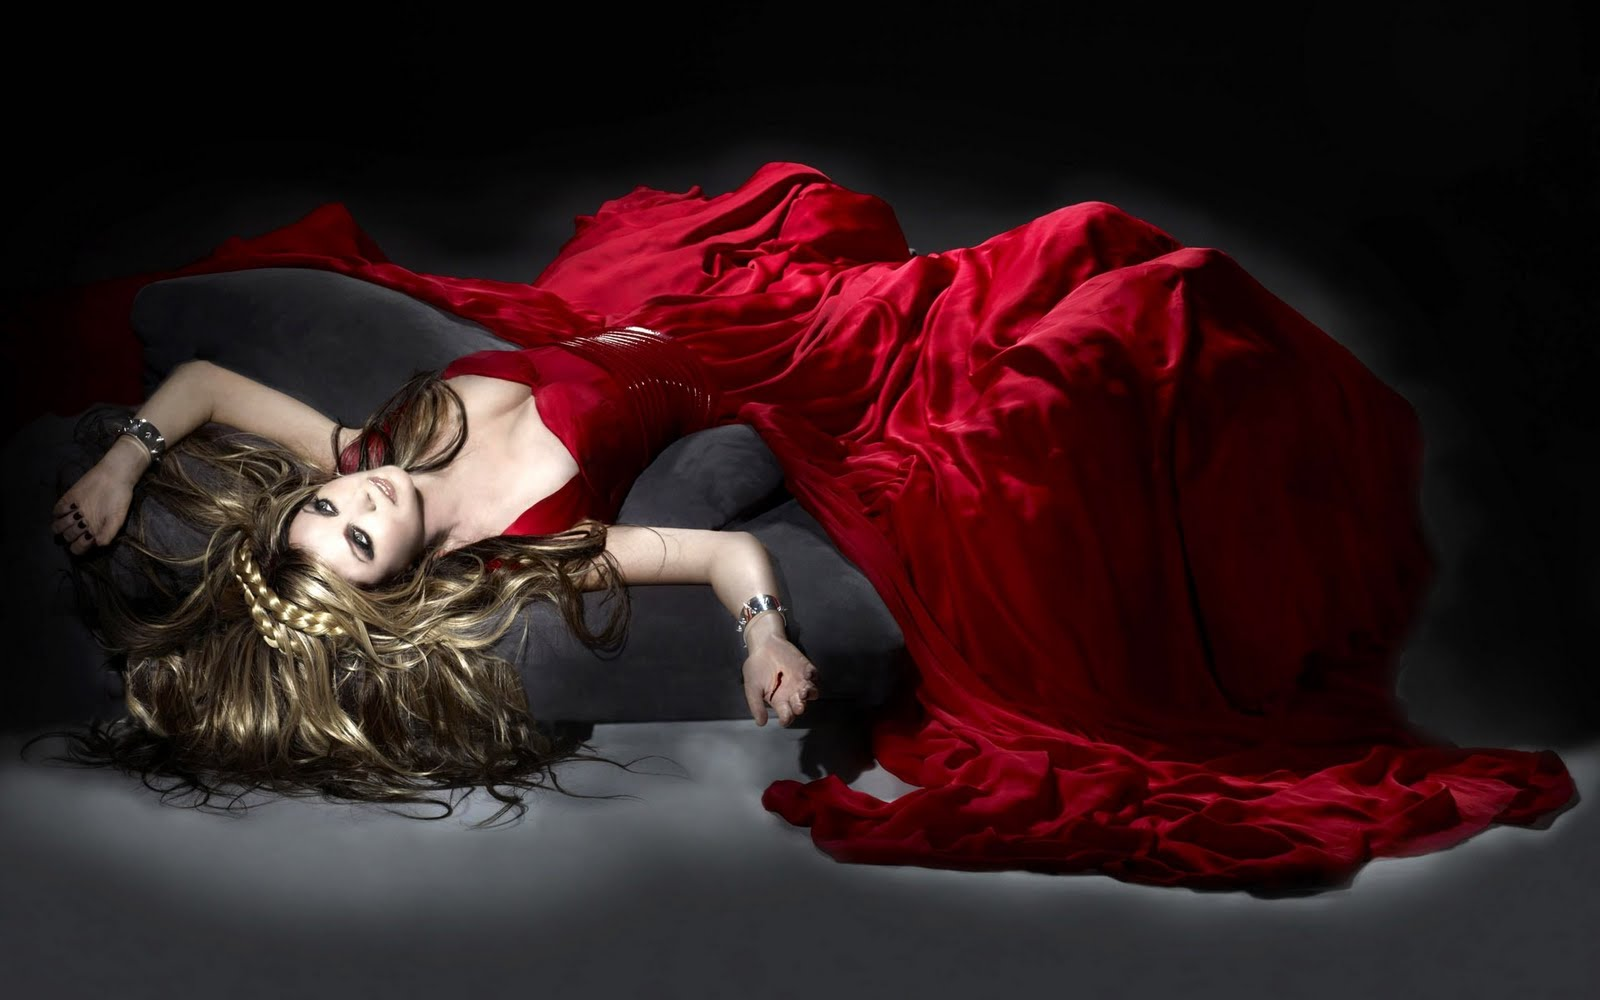 diegosax: Time to say Goodbye de Sarah Brightman y Andrea under betfair casino nj reviews and betfred Bocelli Con ...